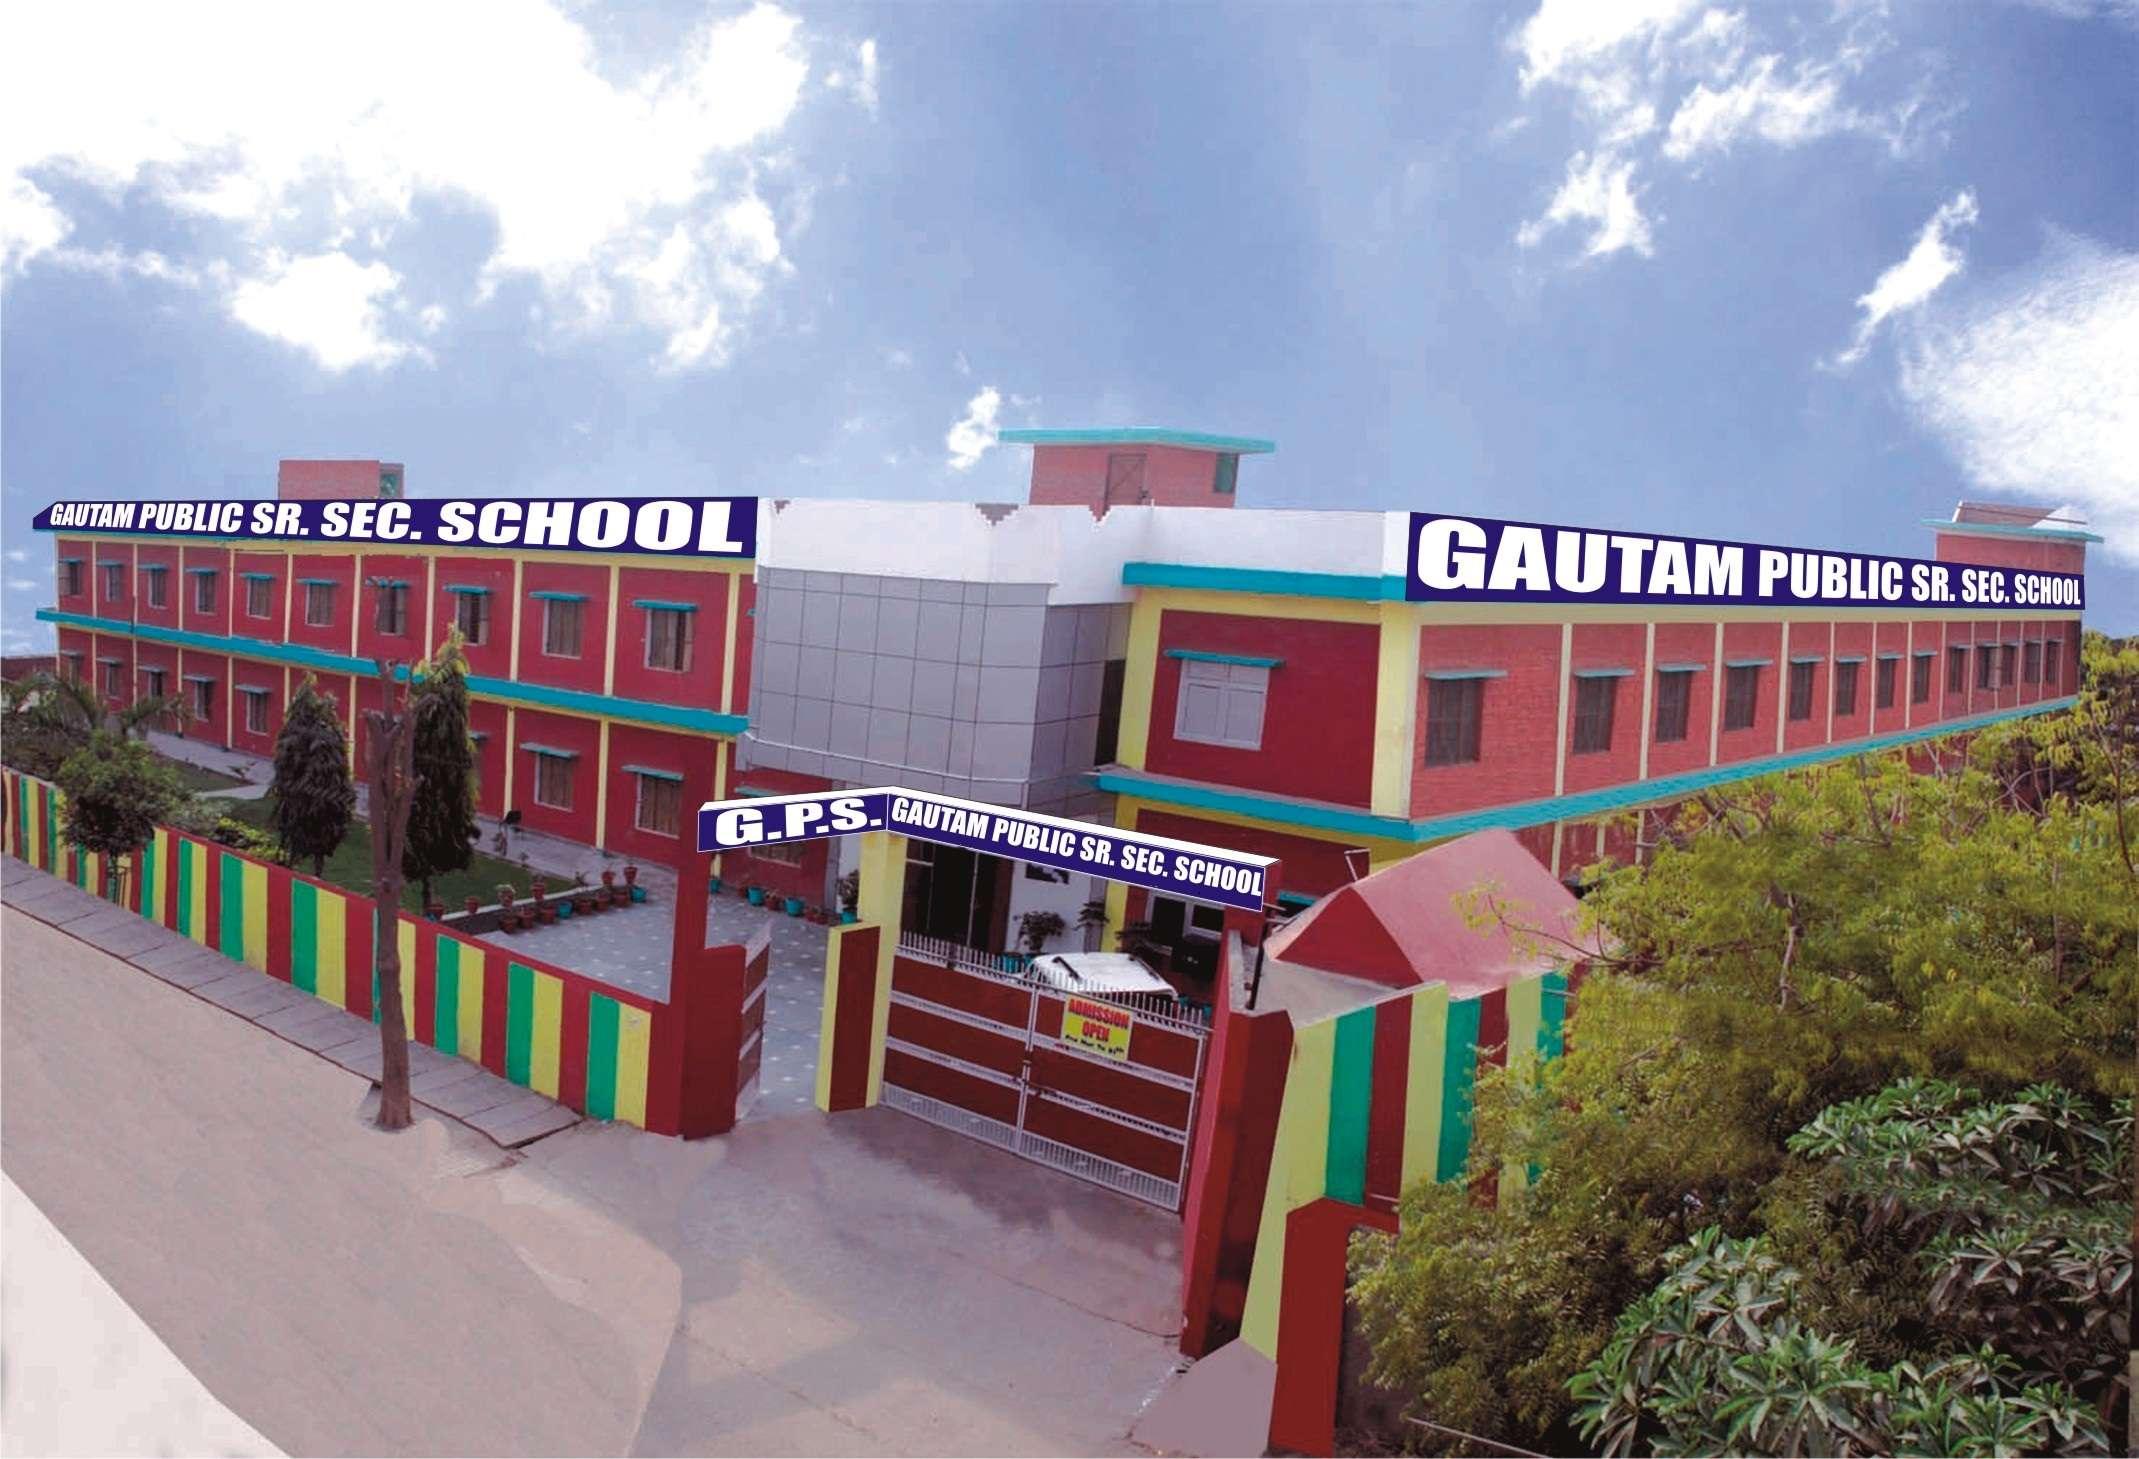 GAUTAM PUBLIC SCHOOL P BLOCK SECTOR 12 PRATAP VIHAR GHAZIABAD 2131386